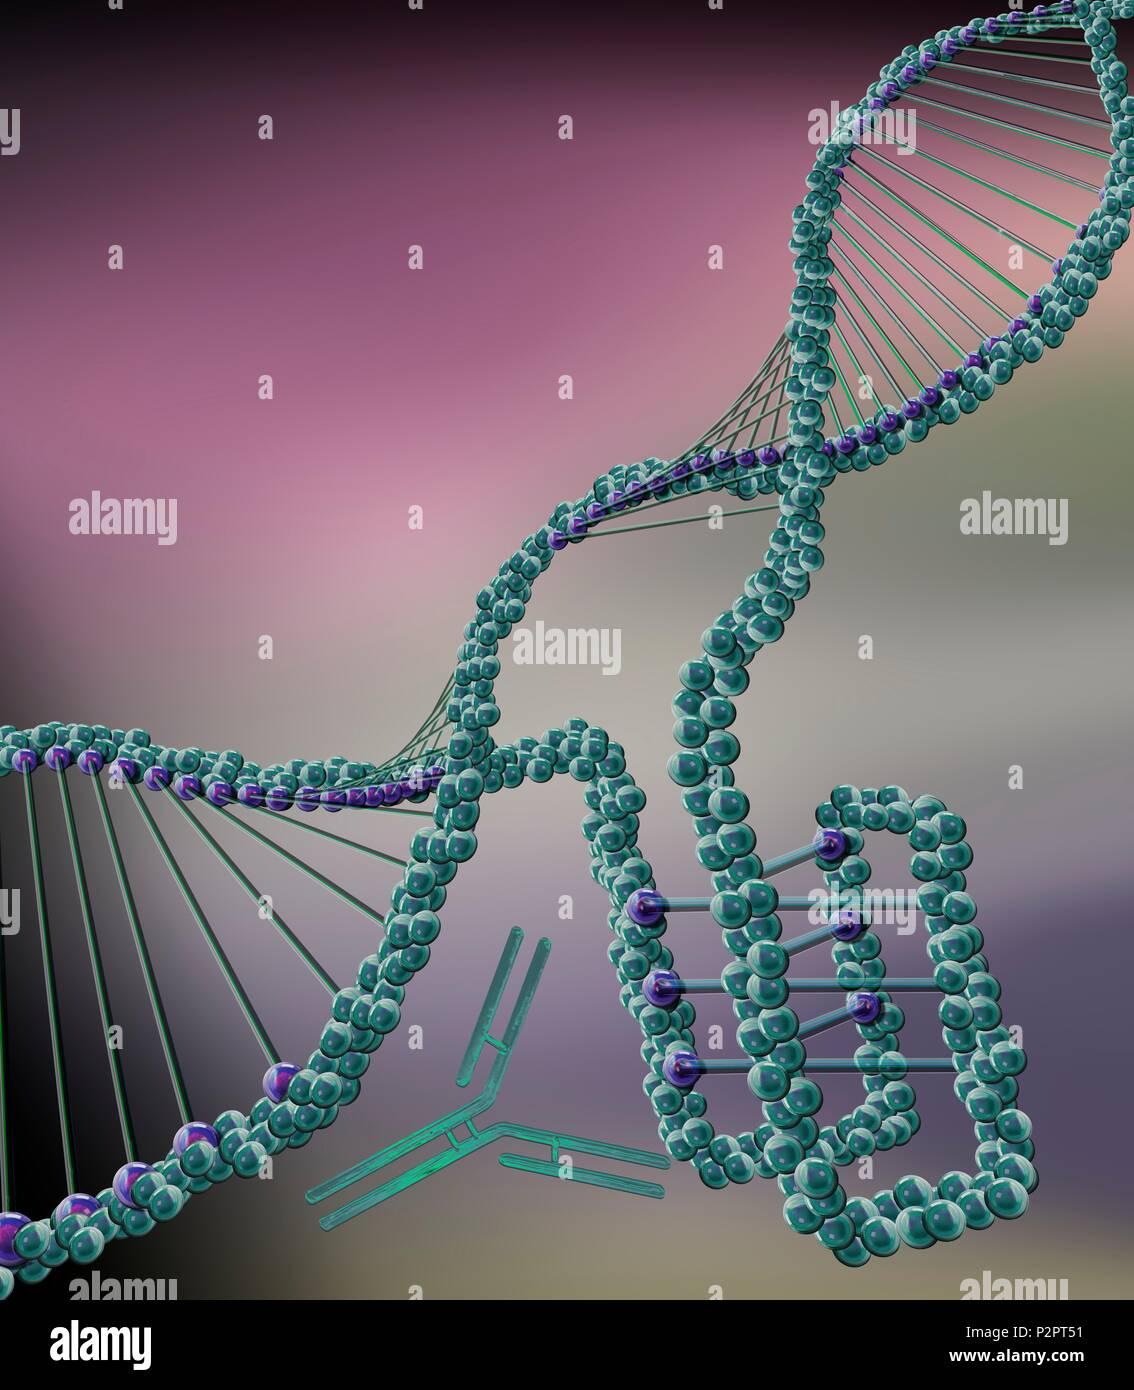 dna nucleotide ba self reliance - HD893×1024